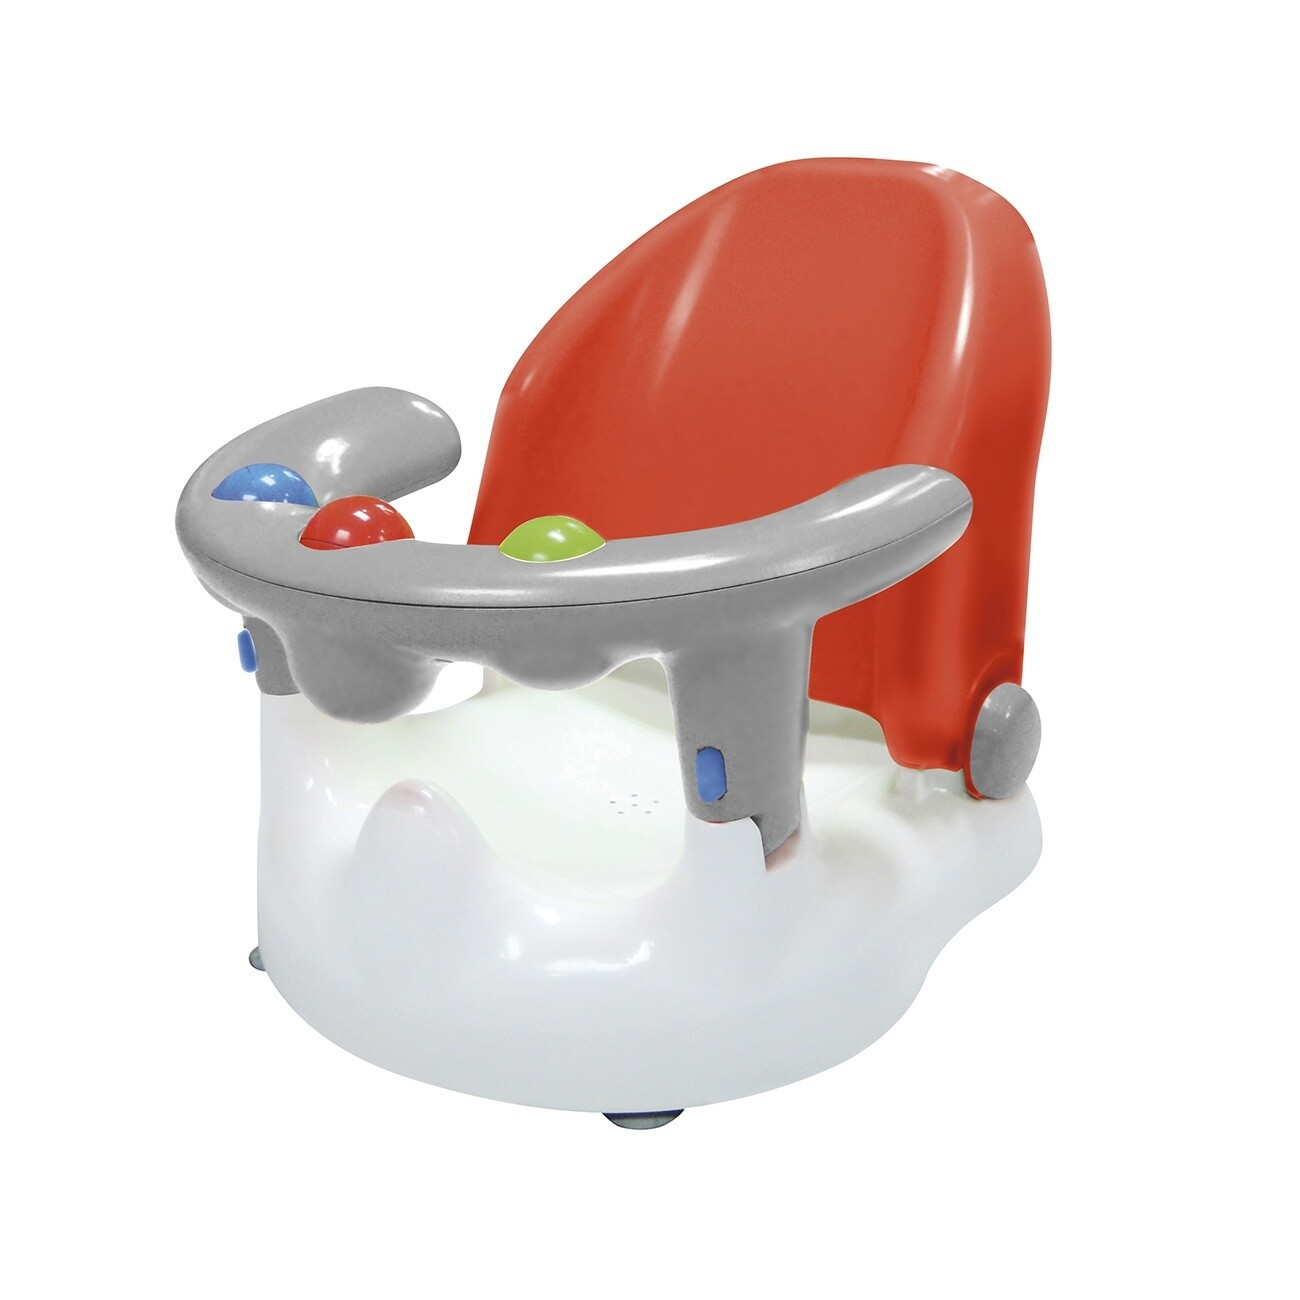 Saro Baby- Badewannensitz rot/grau, 38 cm